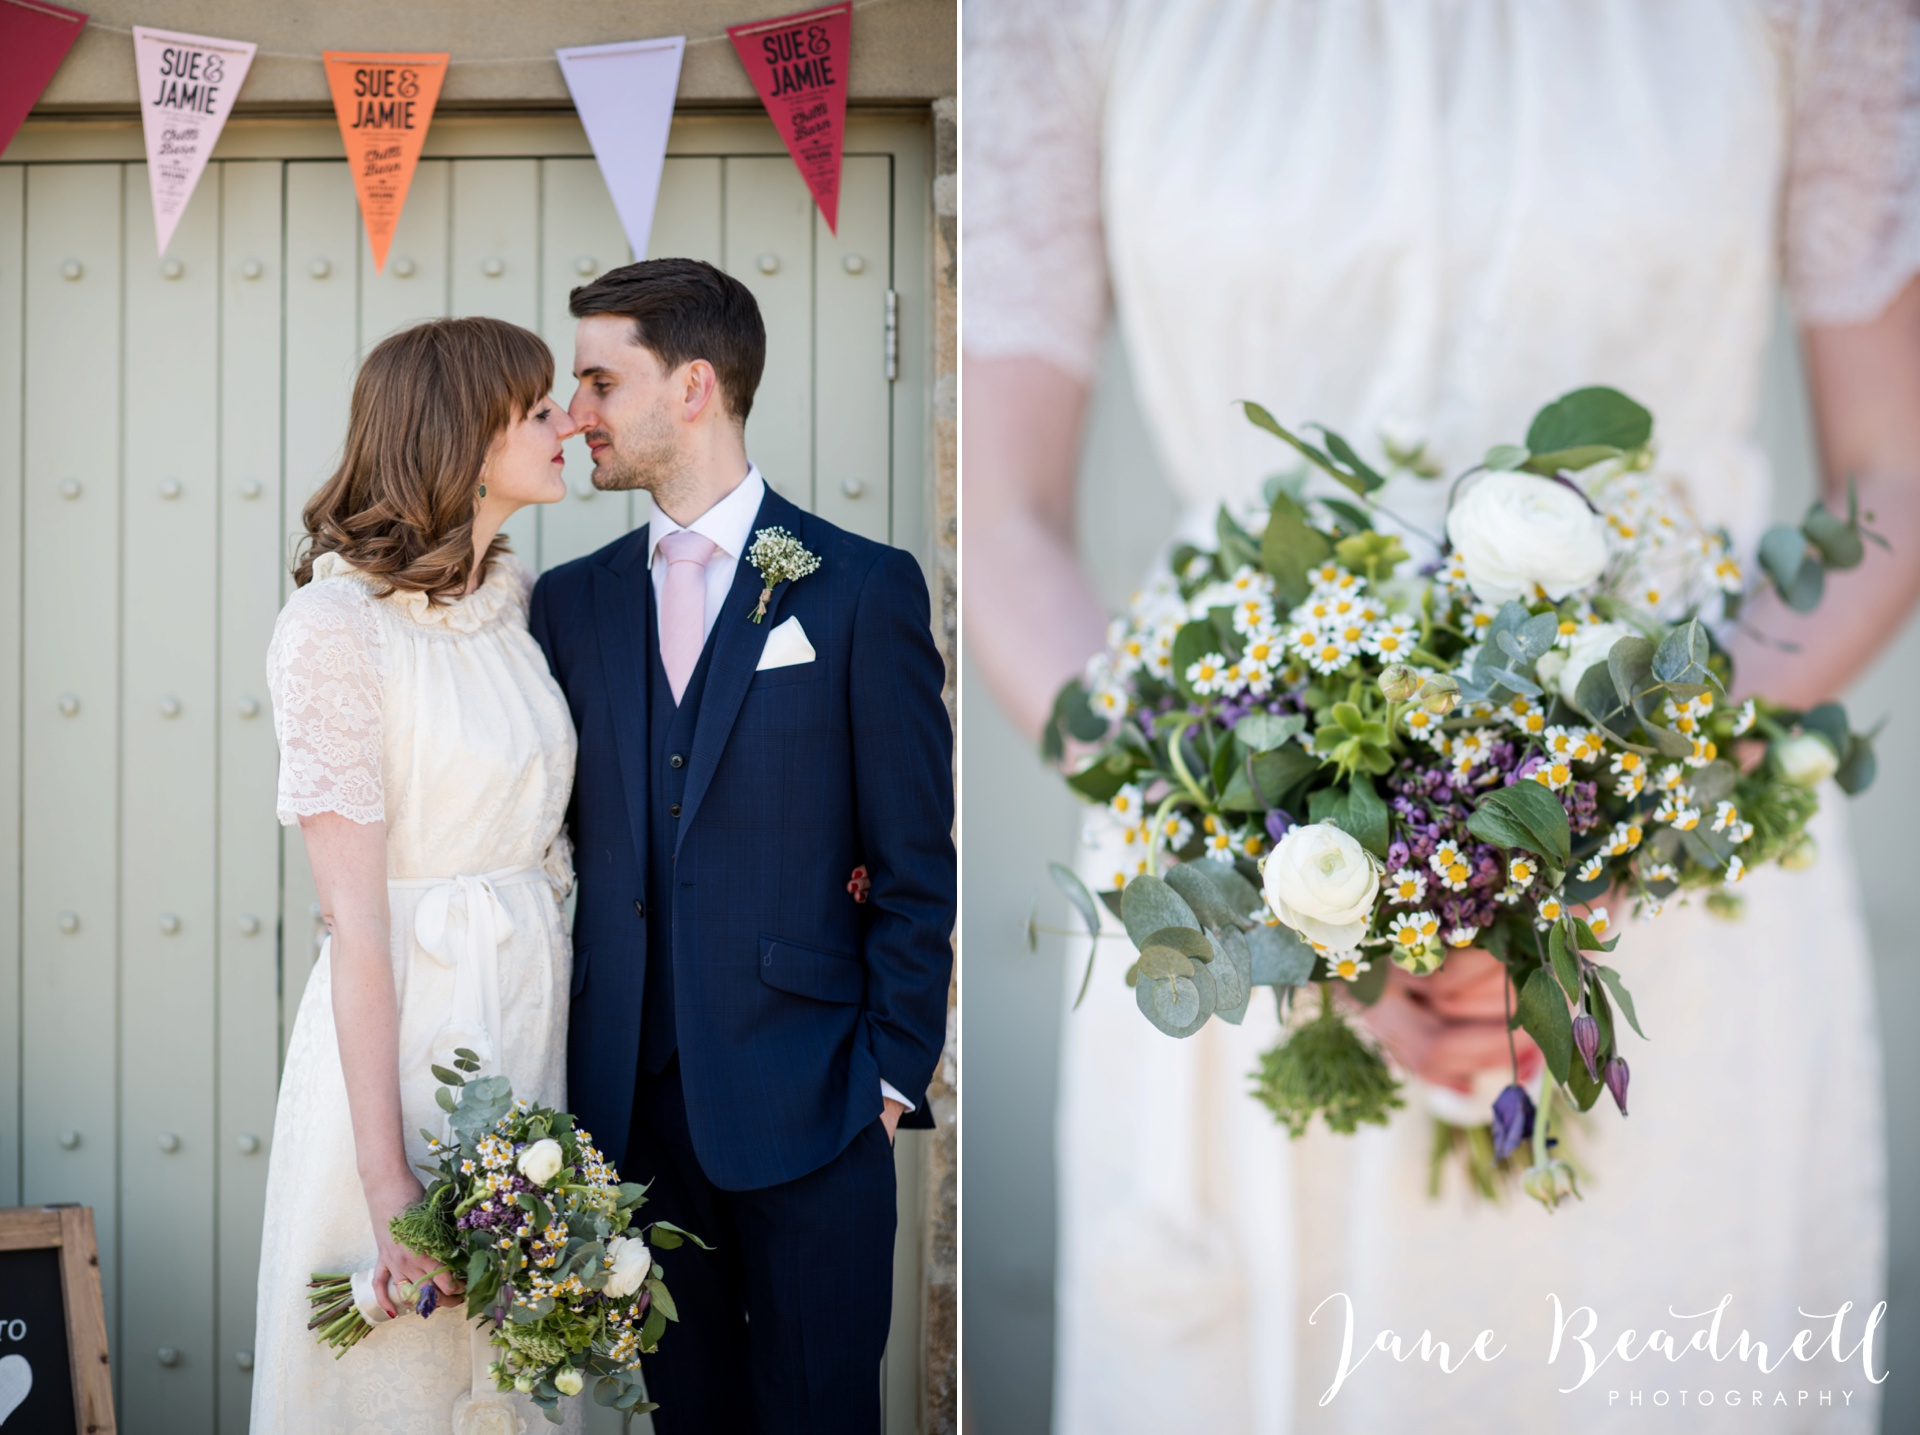 Jane Beadnell fine art wedding photographer The Cheerful Chilli Barn Otley_0036